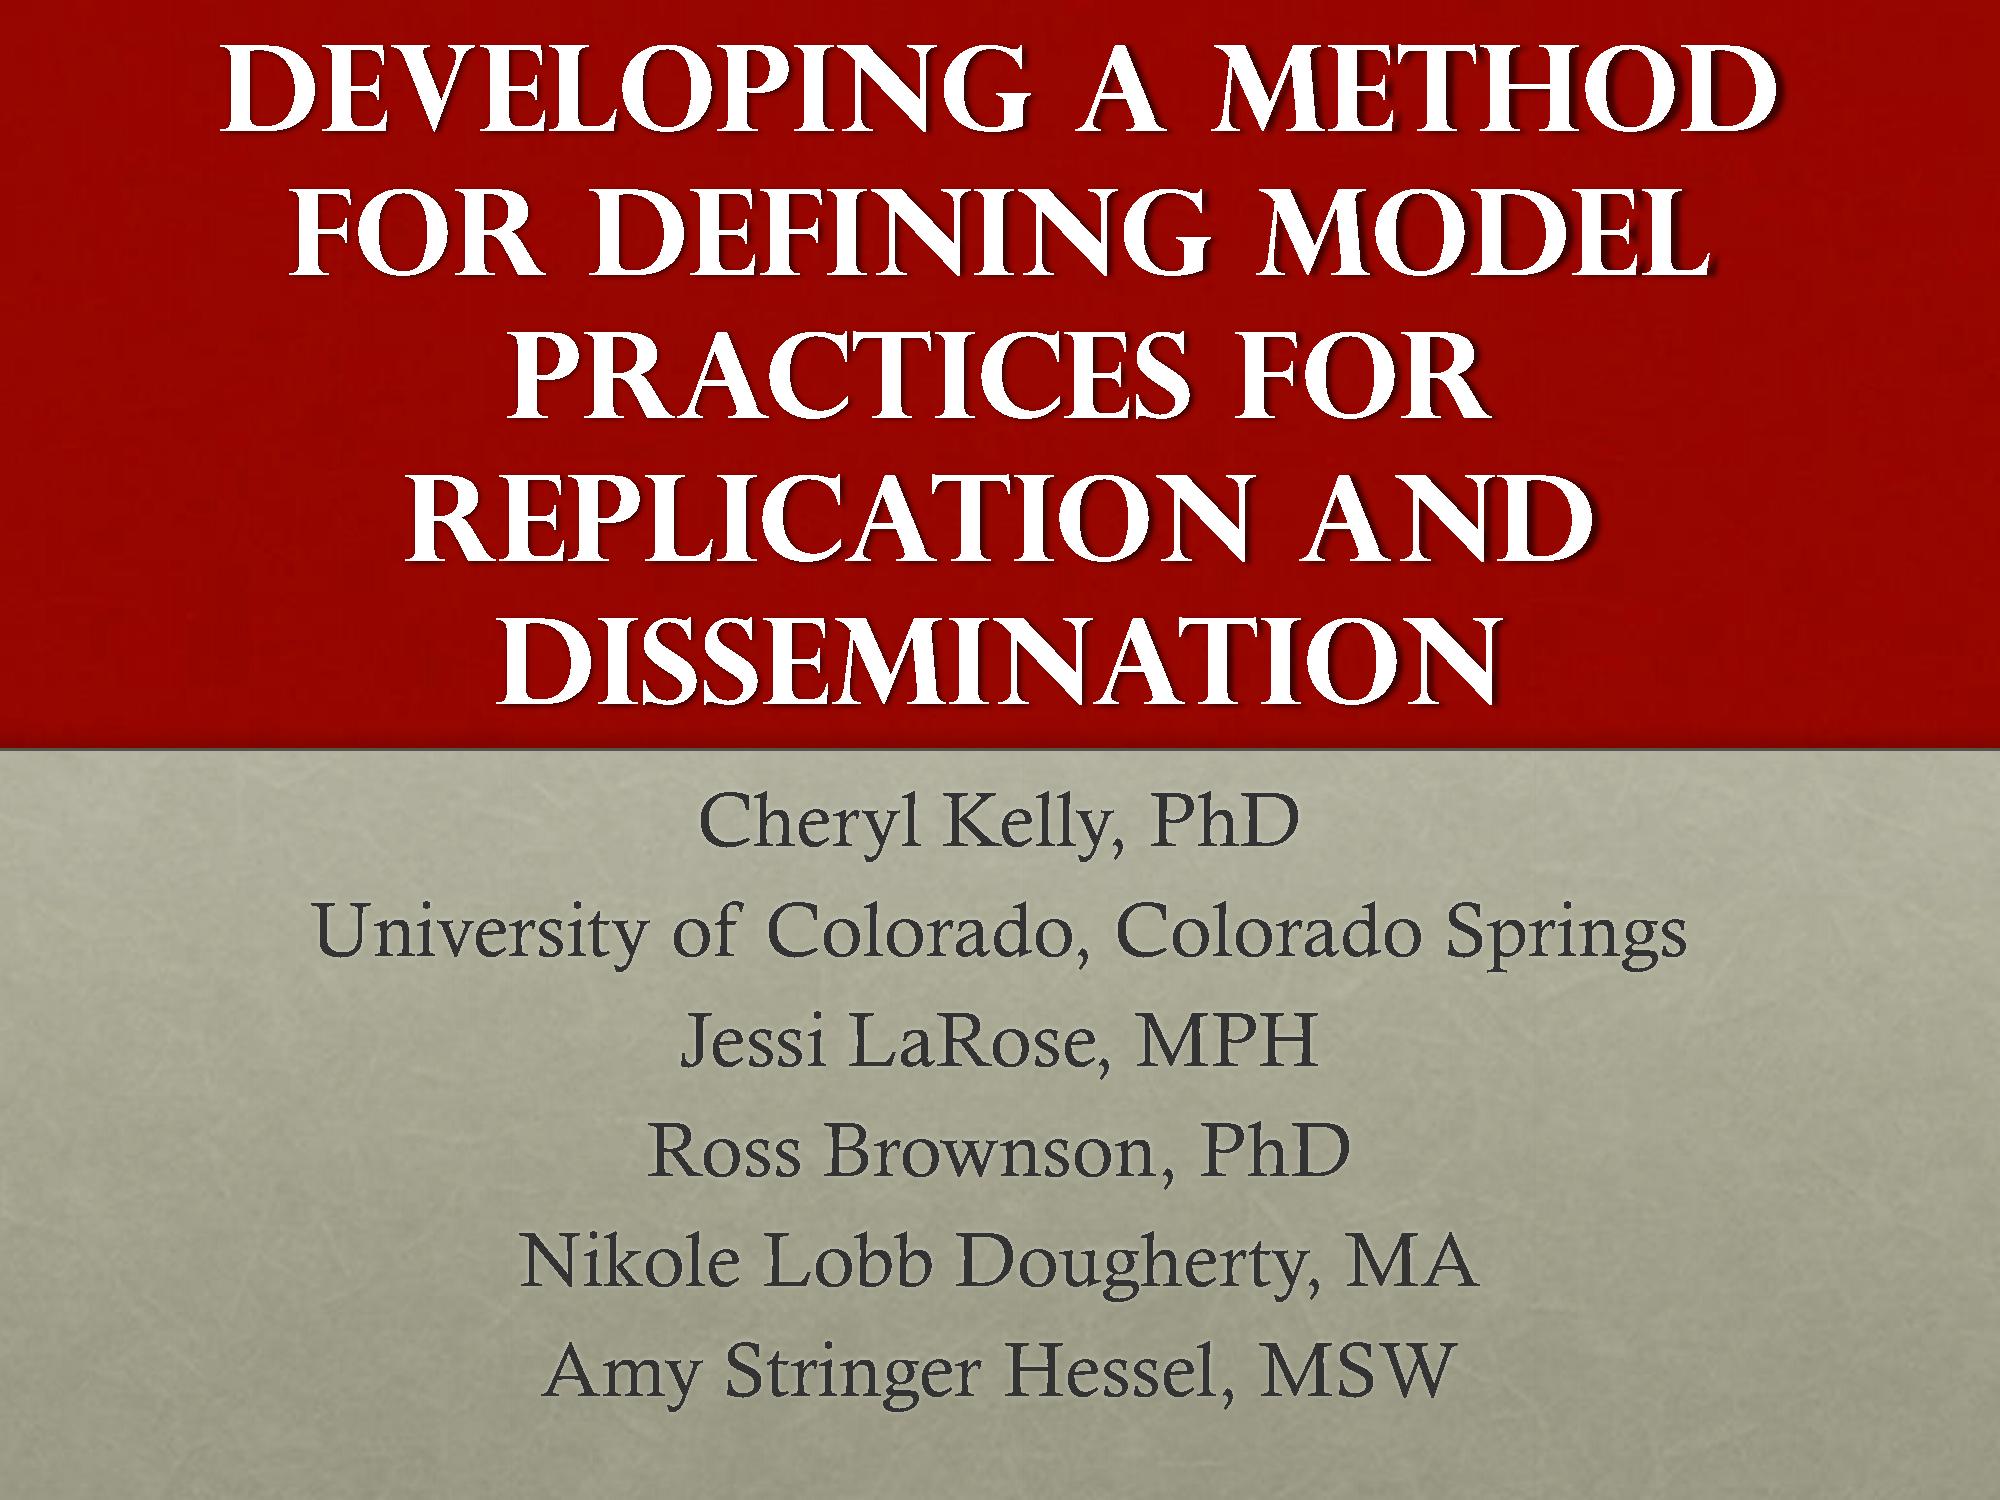 Defining Model Practices ALR Presentation 2012